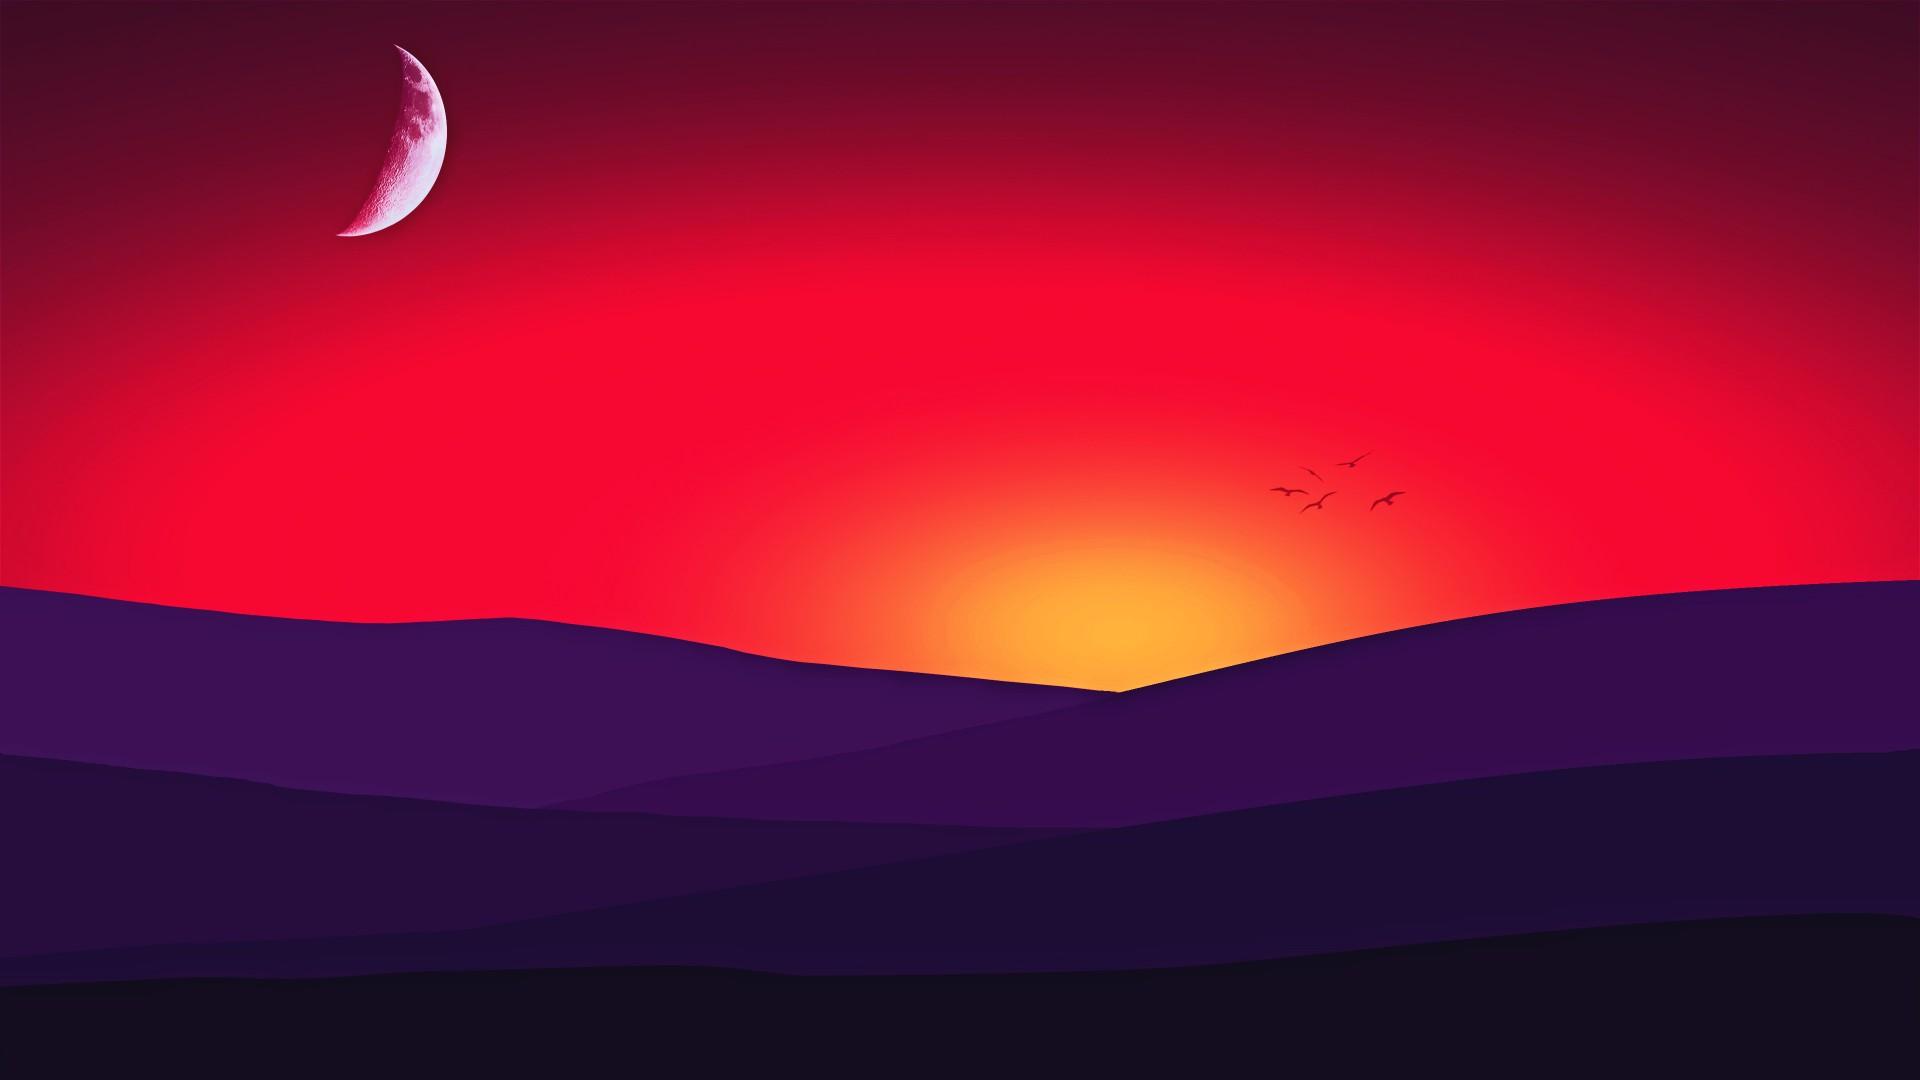 3d Hd Vaporwave Wallpaper Sunset Moon 4k Wallpapers Hd Wallpapers Id 23295